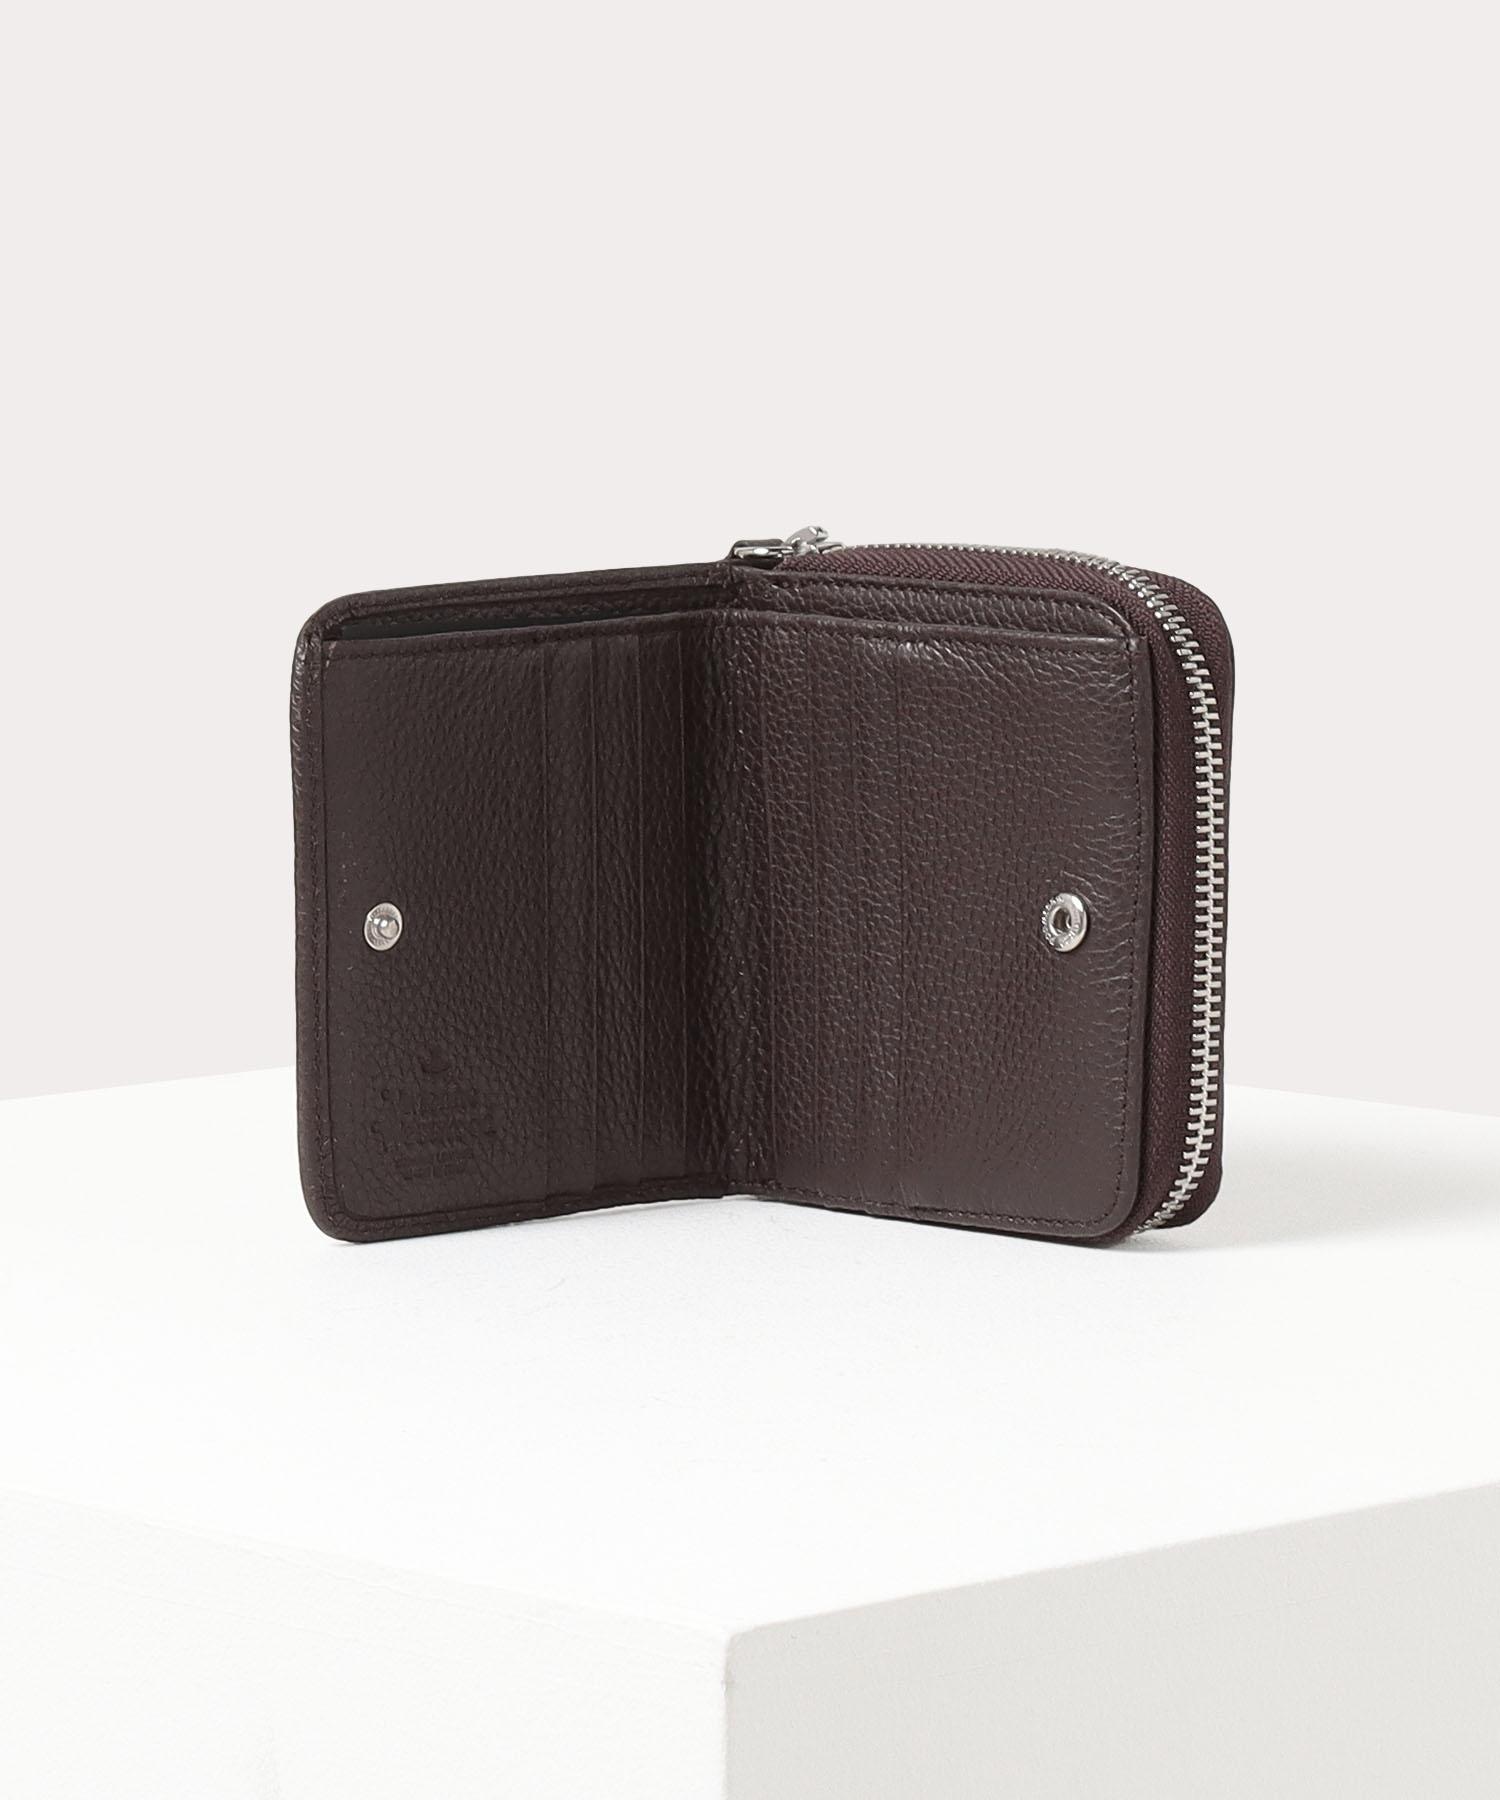 JORDAN ラウンドファスナー二つ折り財布